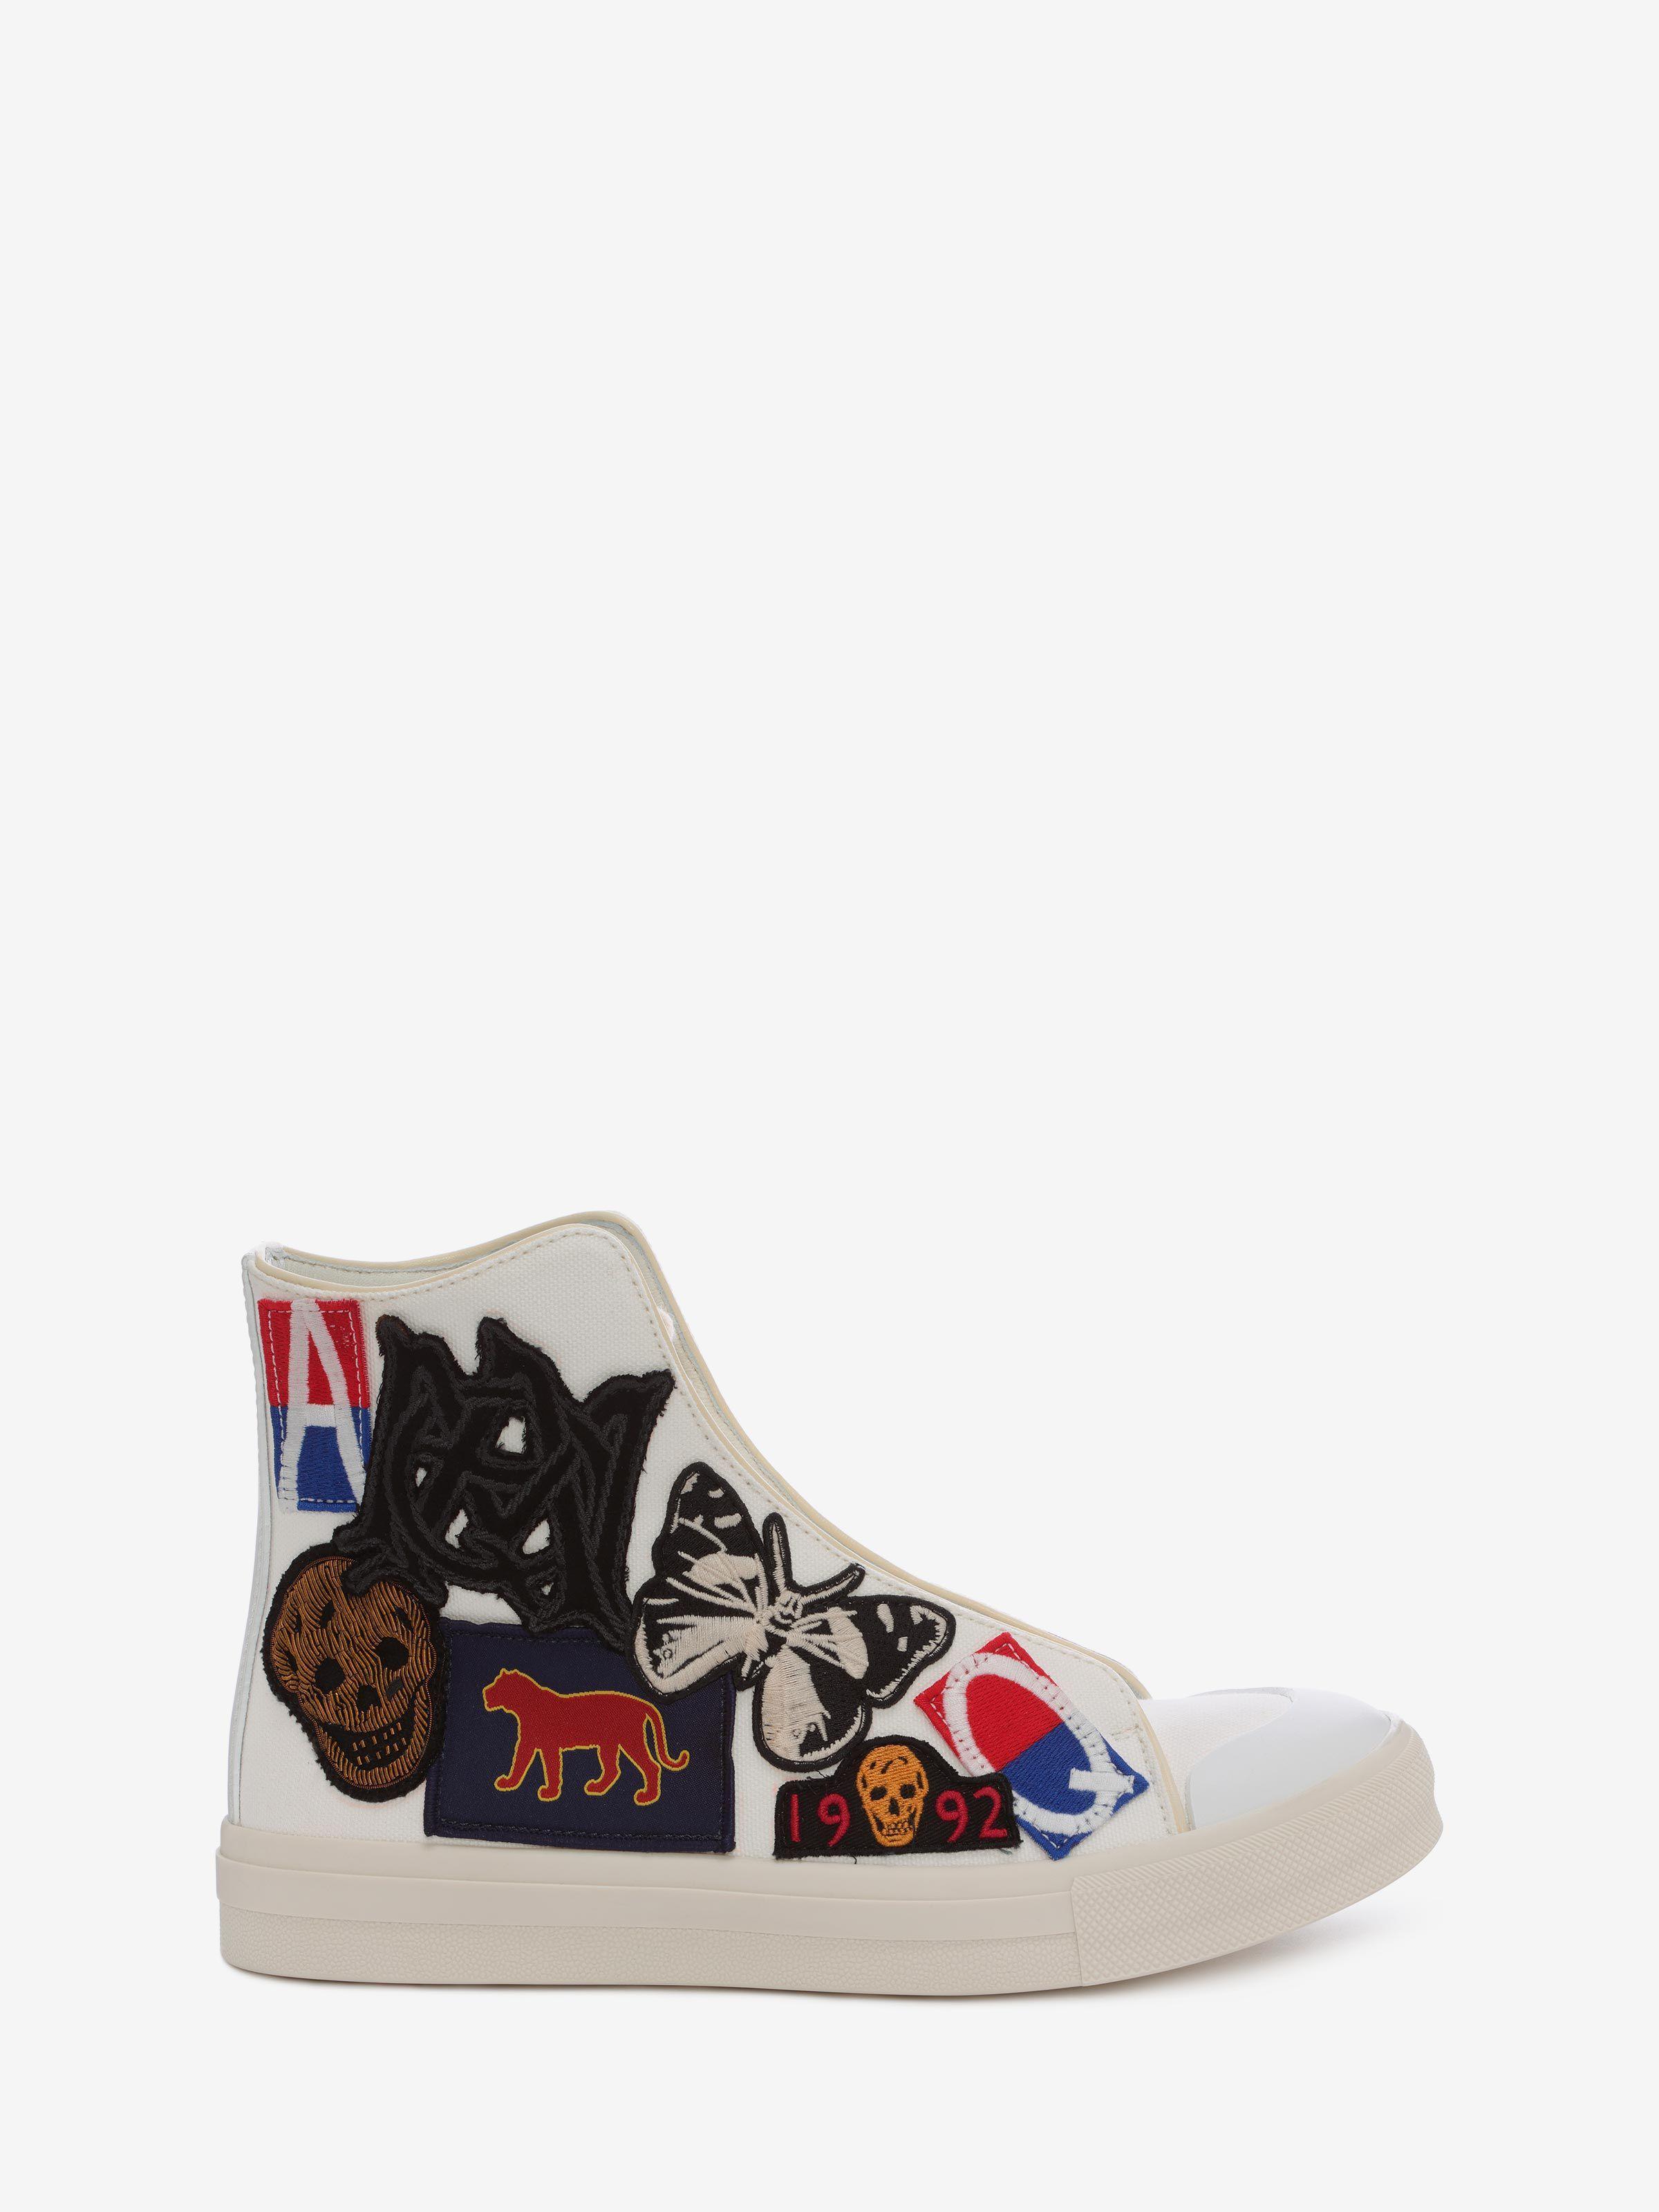 Alexander Mcqueen High Top Lace Up Sneaker Sneakers U F Lovely